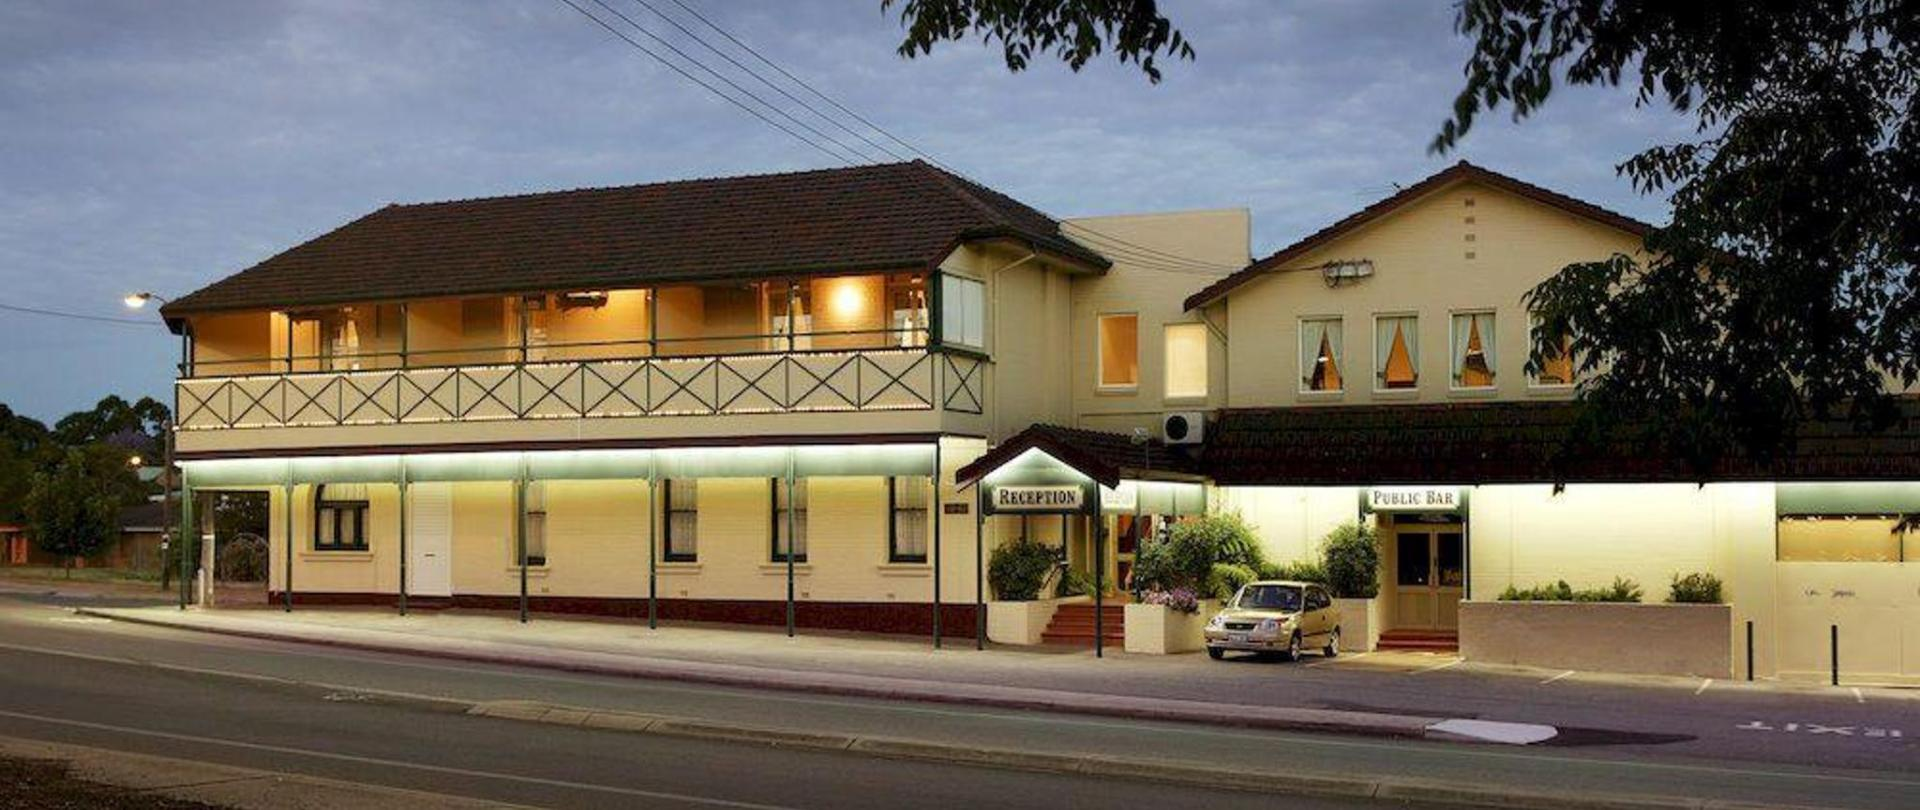 Quality Hotel Bayswater.jpg